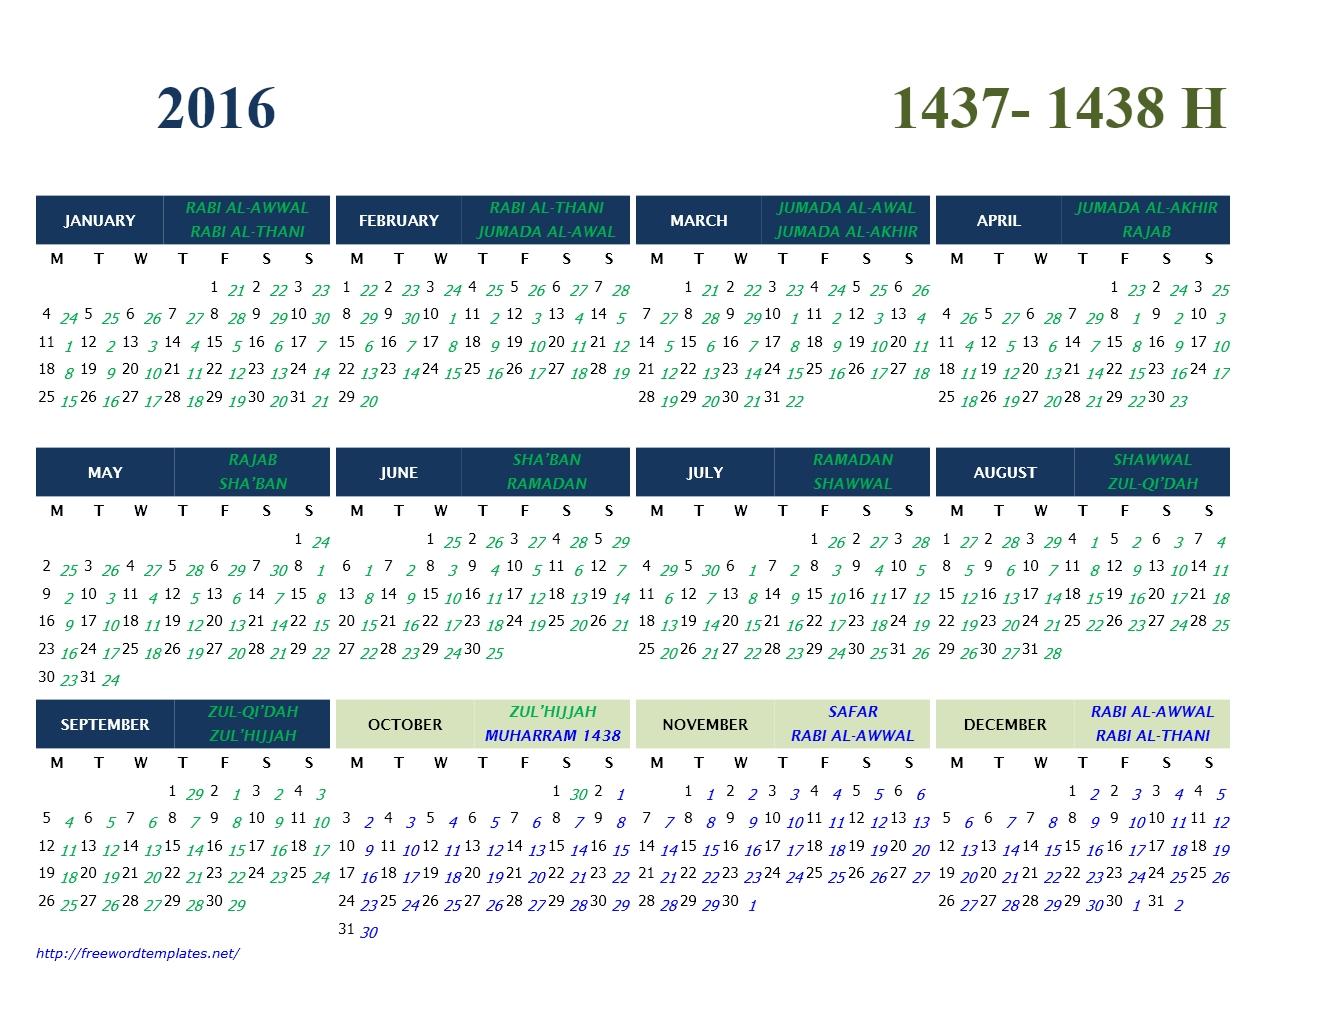 2016 Islamic Calendar Template pertaining to Hijri Calendar 1438 With Gregorian Calendar